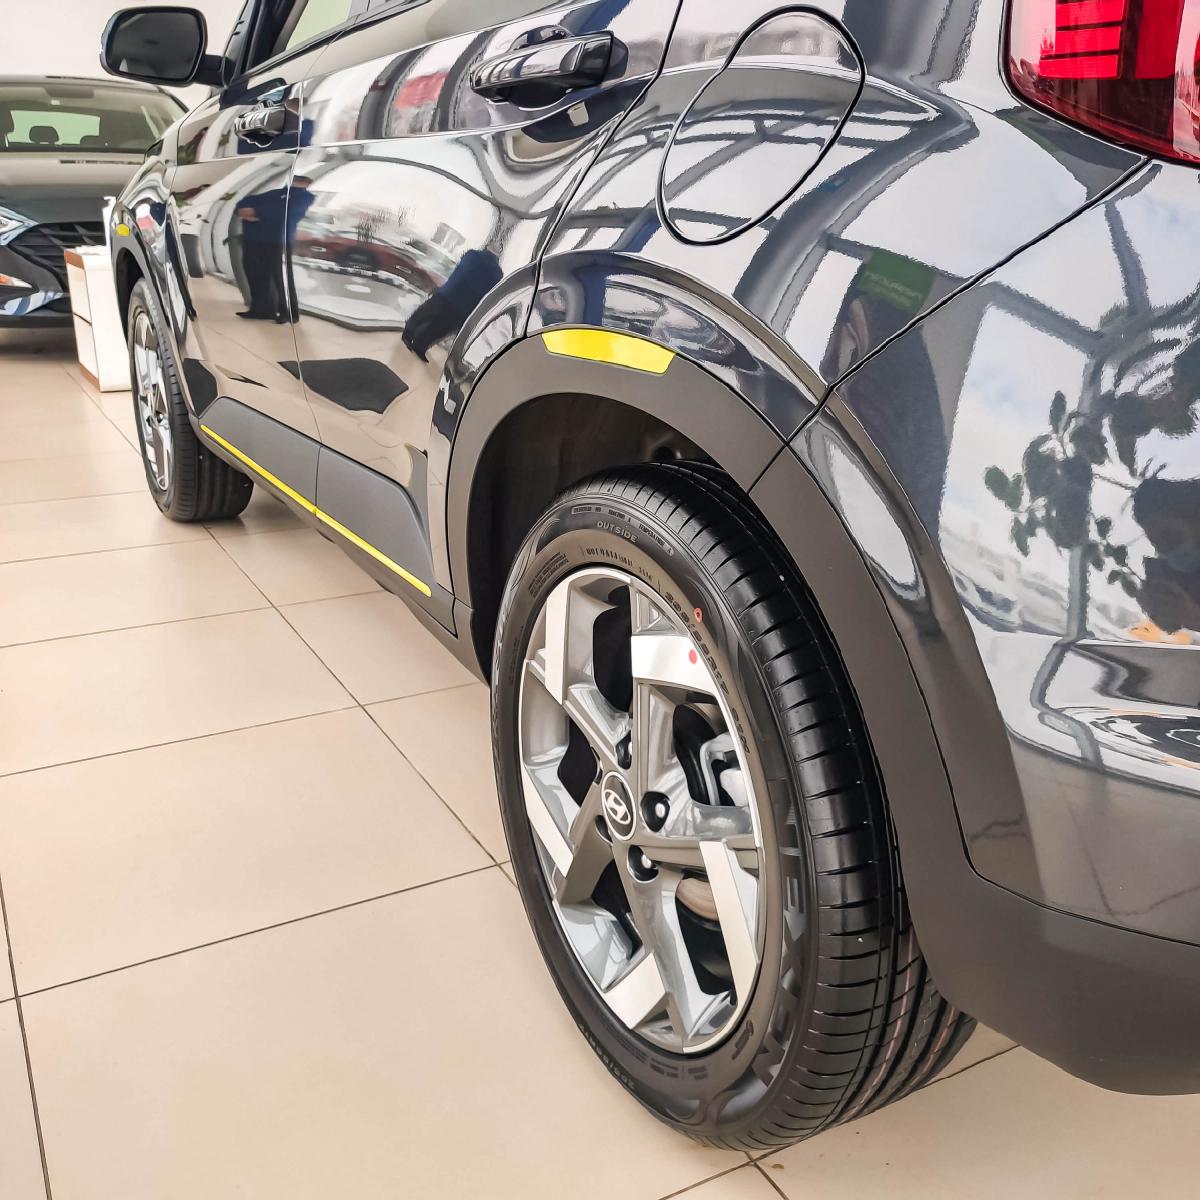 Абсолютно новий компактний міський кросовер Hyundai Venue   Хюндай Мотор Україна - фото 10